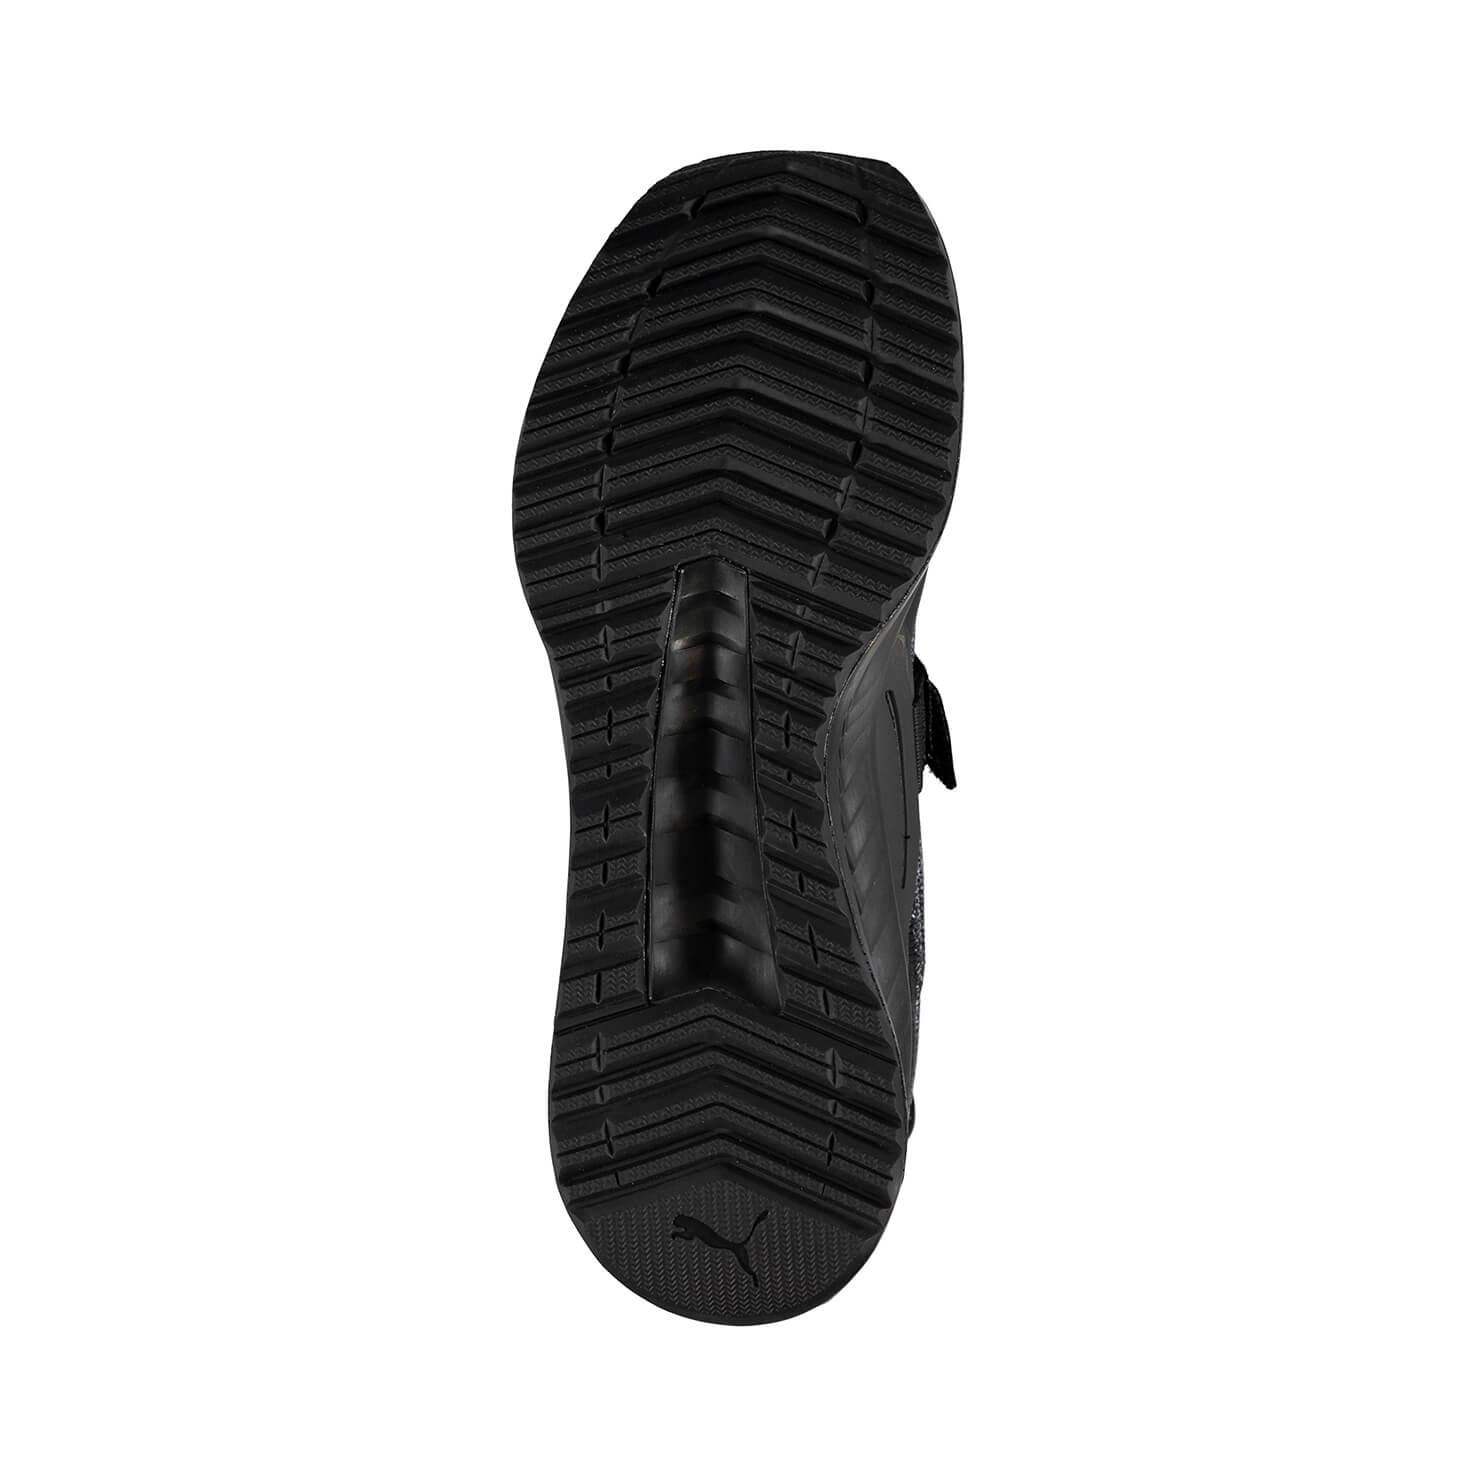 Puma Ignite Evoknit 2 Erkek Siyah Spor Ayakkabı